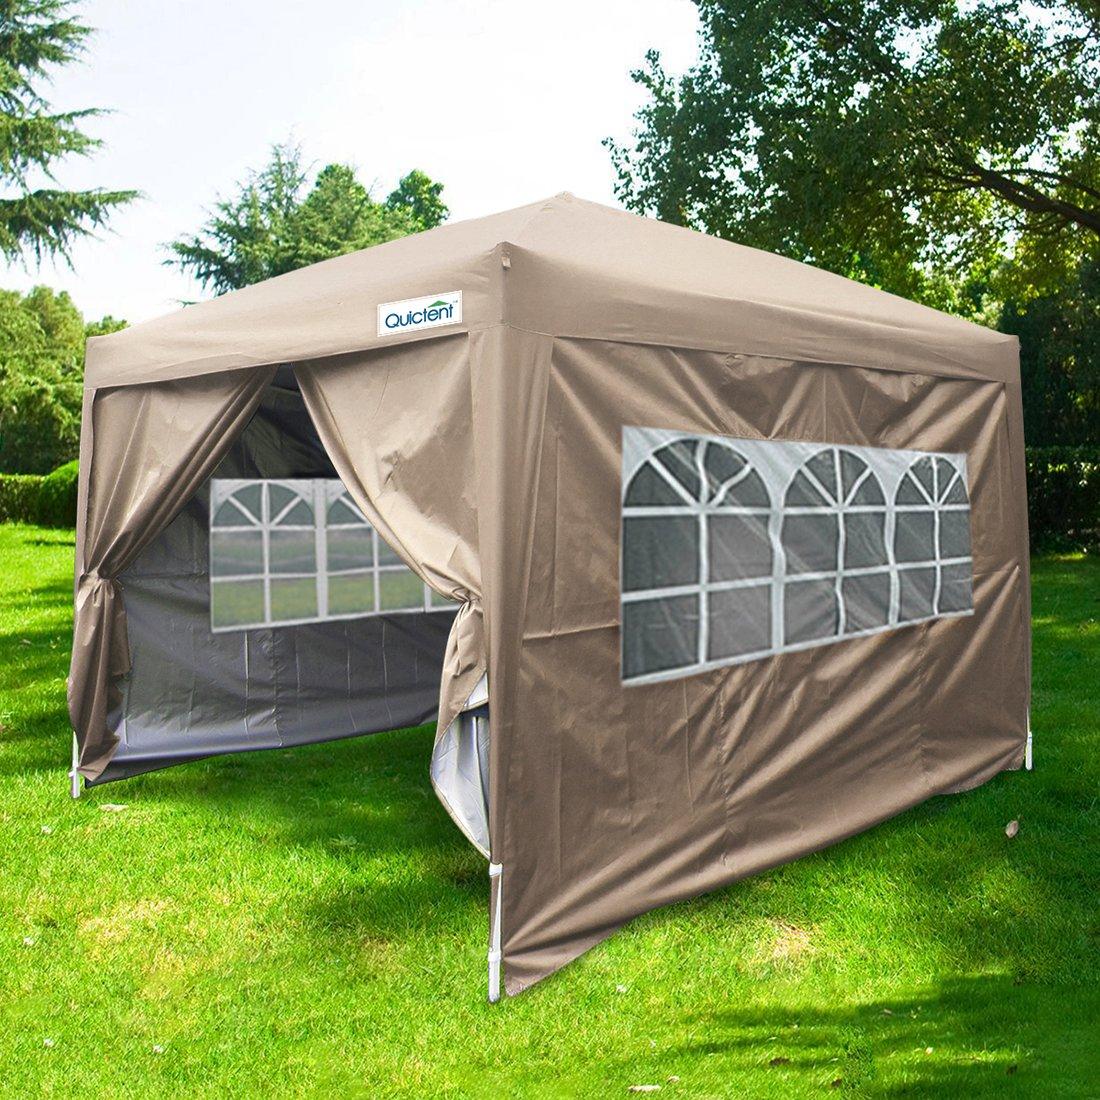 quictent silvox 10x10 ez pop up party tent canopy gazebo 4 walls w free carry bag 100. Black Bedroom Furniture Sets. Home Design Ideas